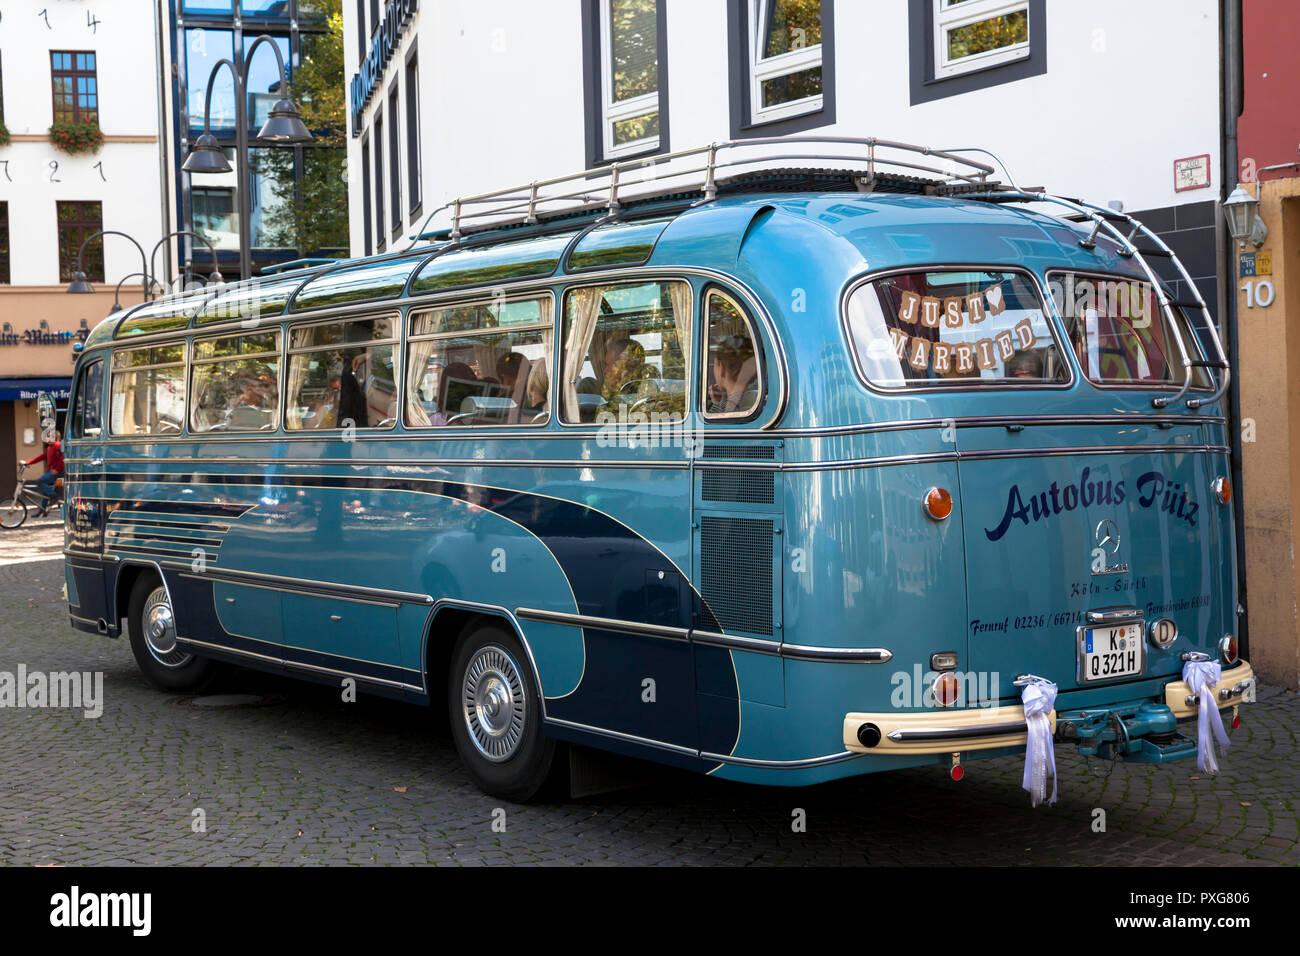 Mercedes Benz Oldtimer Bus Model O 321 H On The Heumarkt Booked For